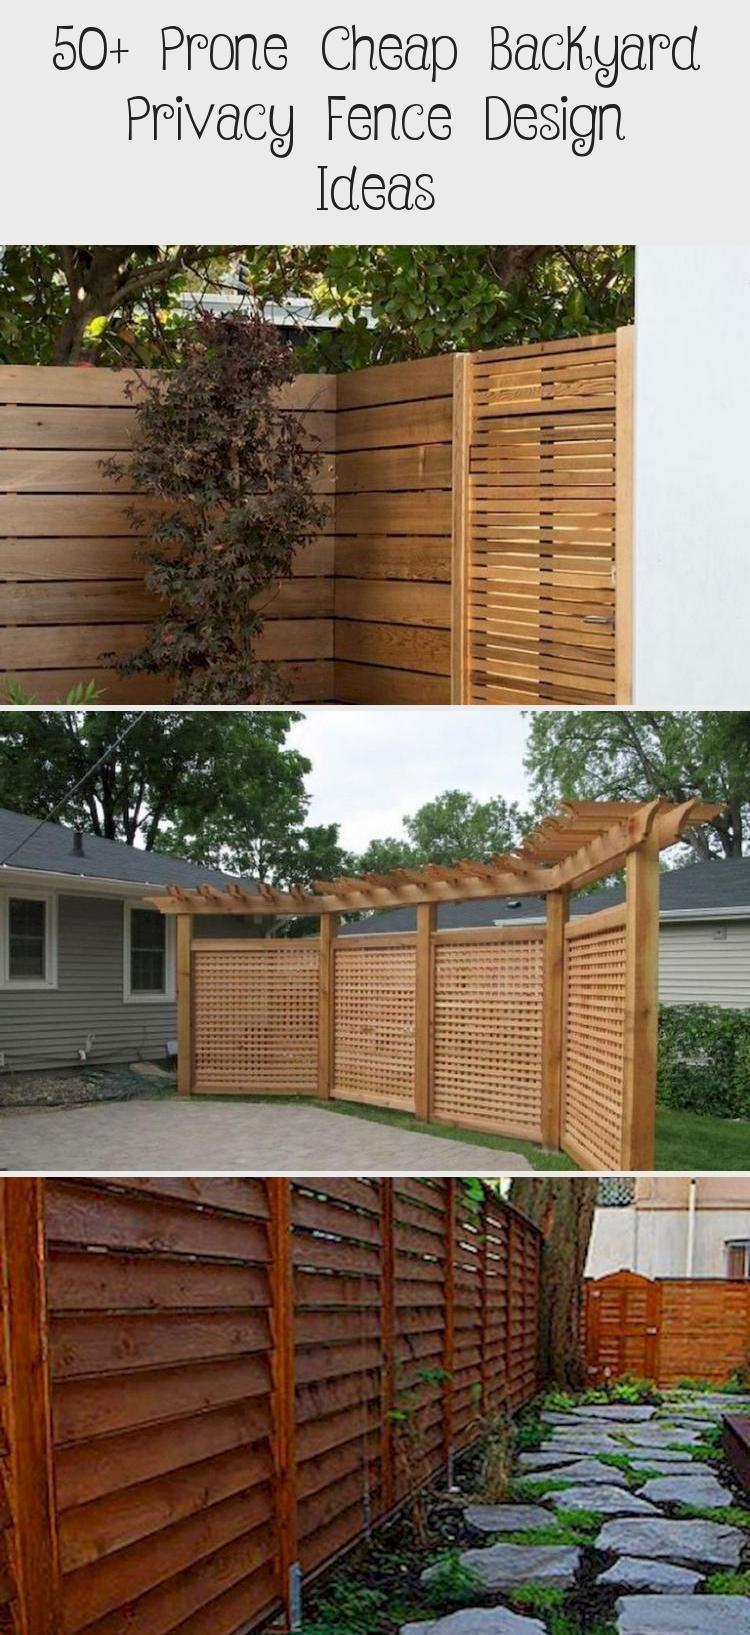 Photo of 50+ Prone Cheap Backyard Privacy Fence Design Ideas – Pinokyo